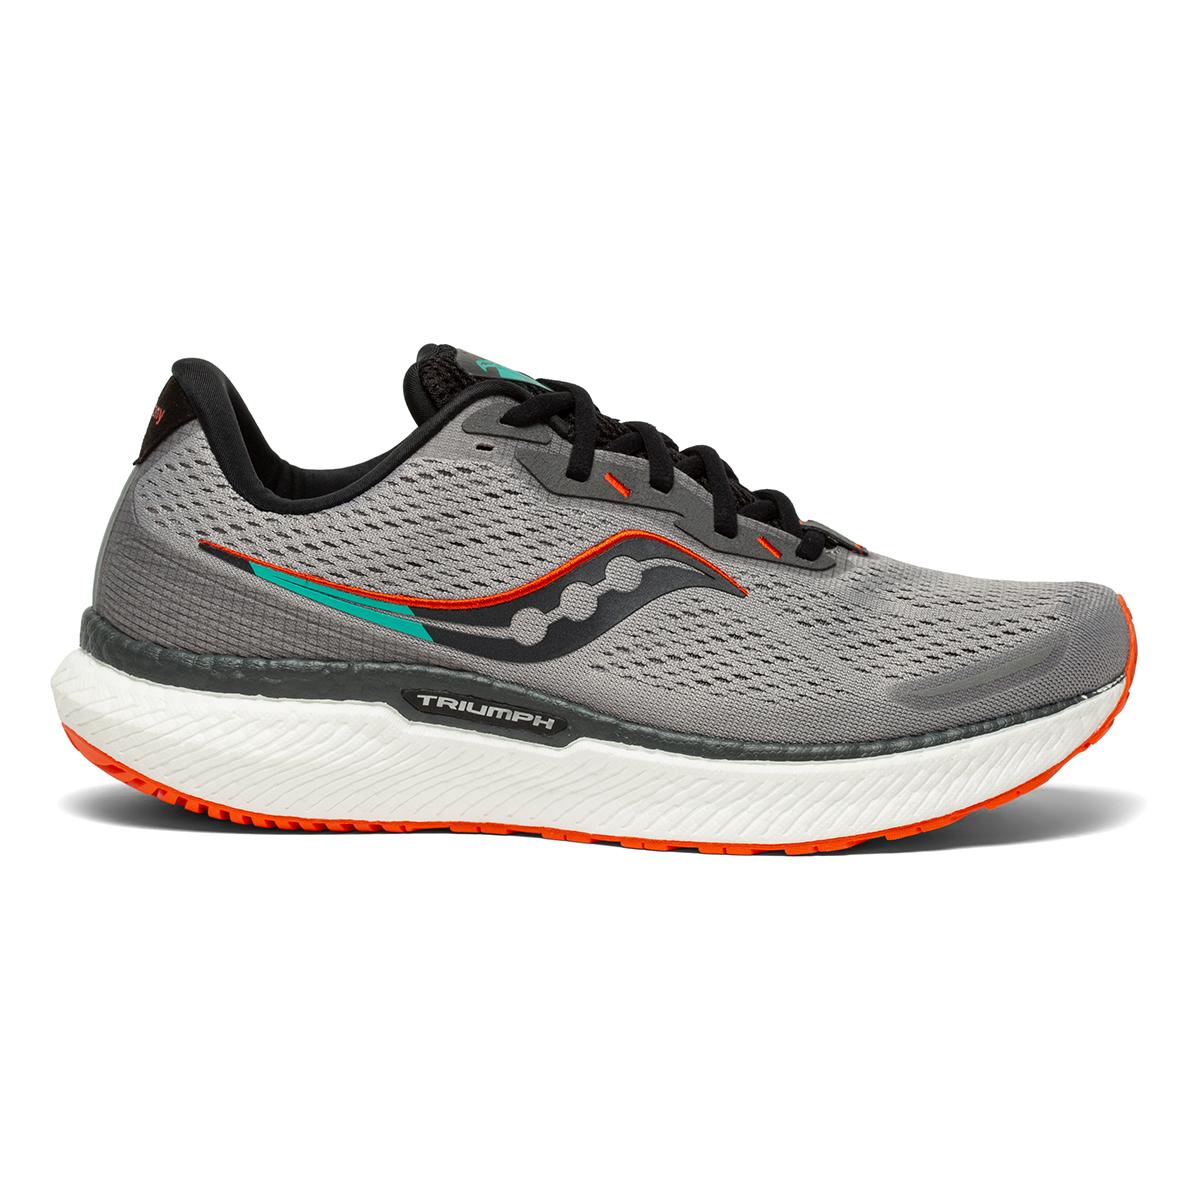 Men's Saucony Triumph 19 Running Shoe - Color: Alloy / Fire - Size: 7 - Width: Wide, Alloy / Fire, large, image 1